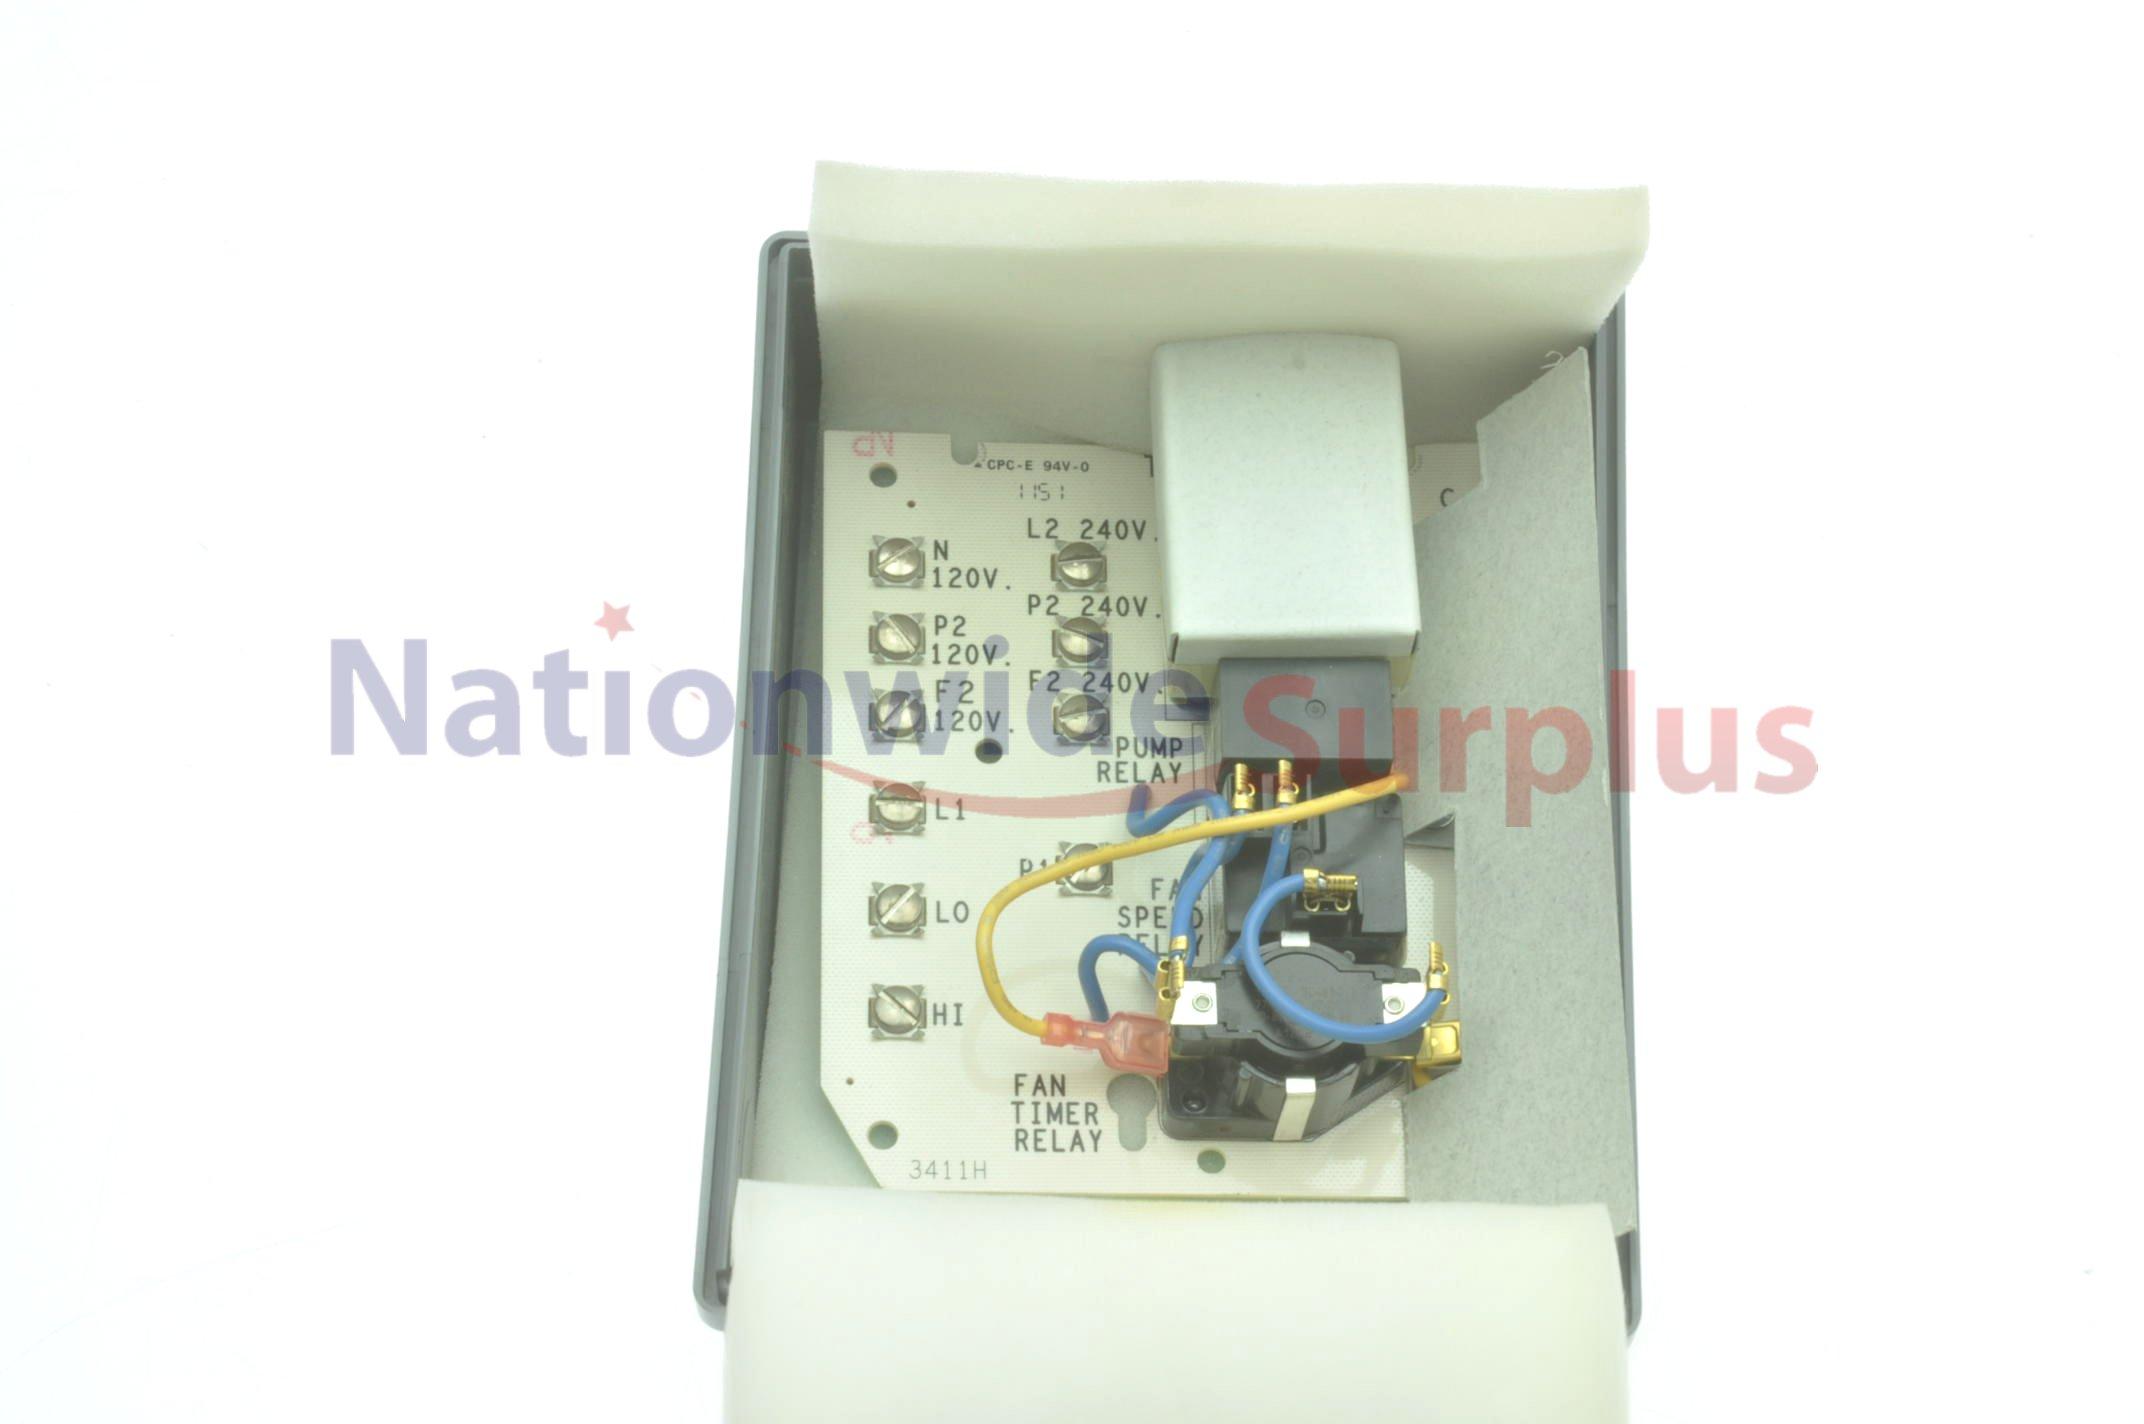 mastercool evaporative cooler wiring diagram mastercool wiring diagram free